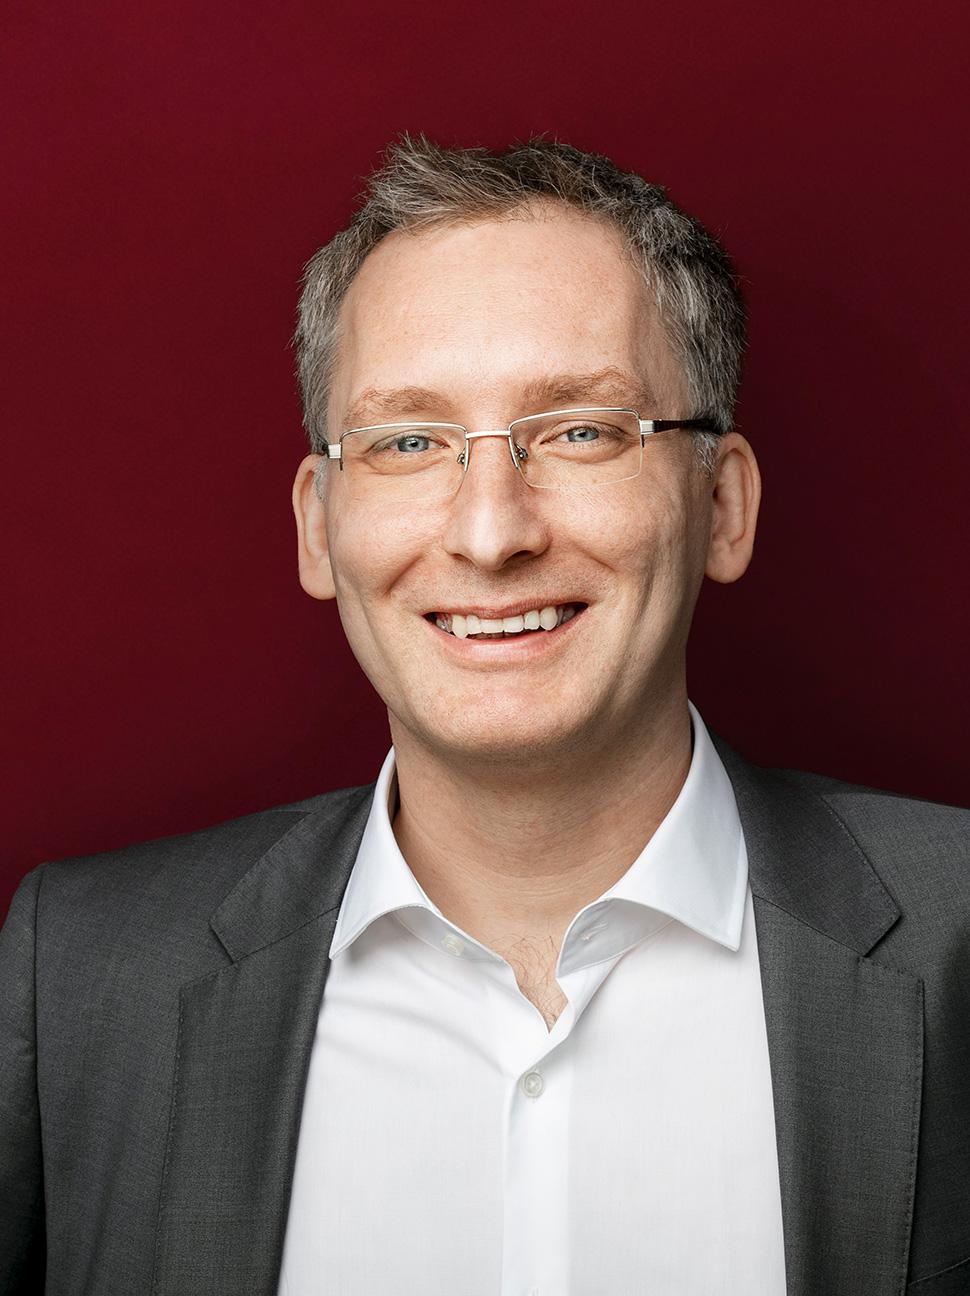 Mathias Papendieck